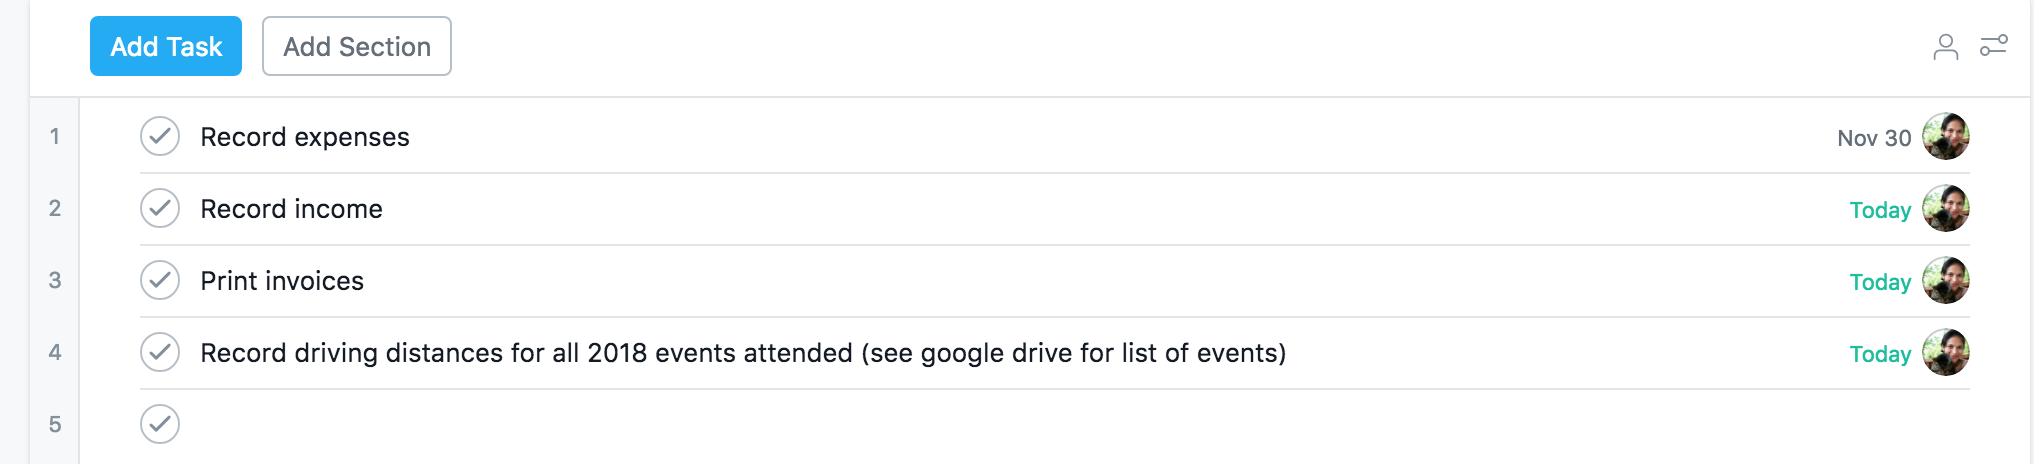 List View in Asana